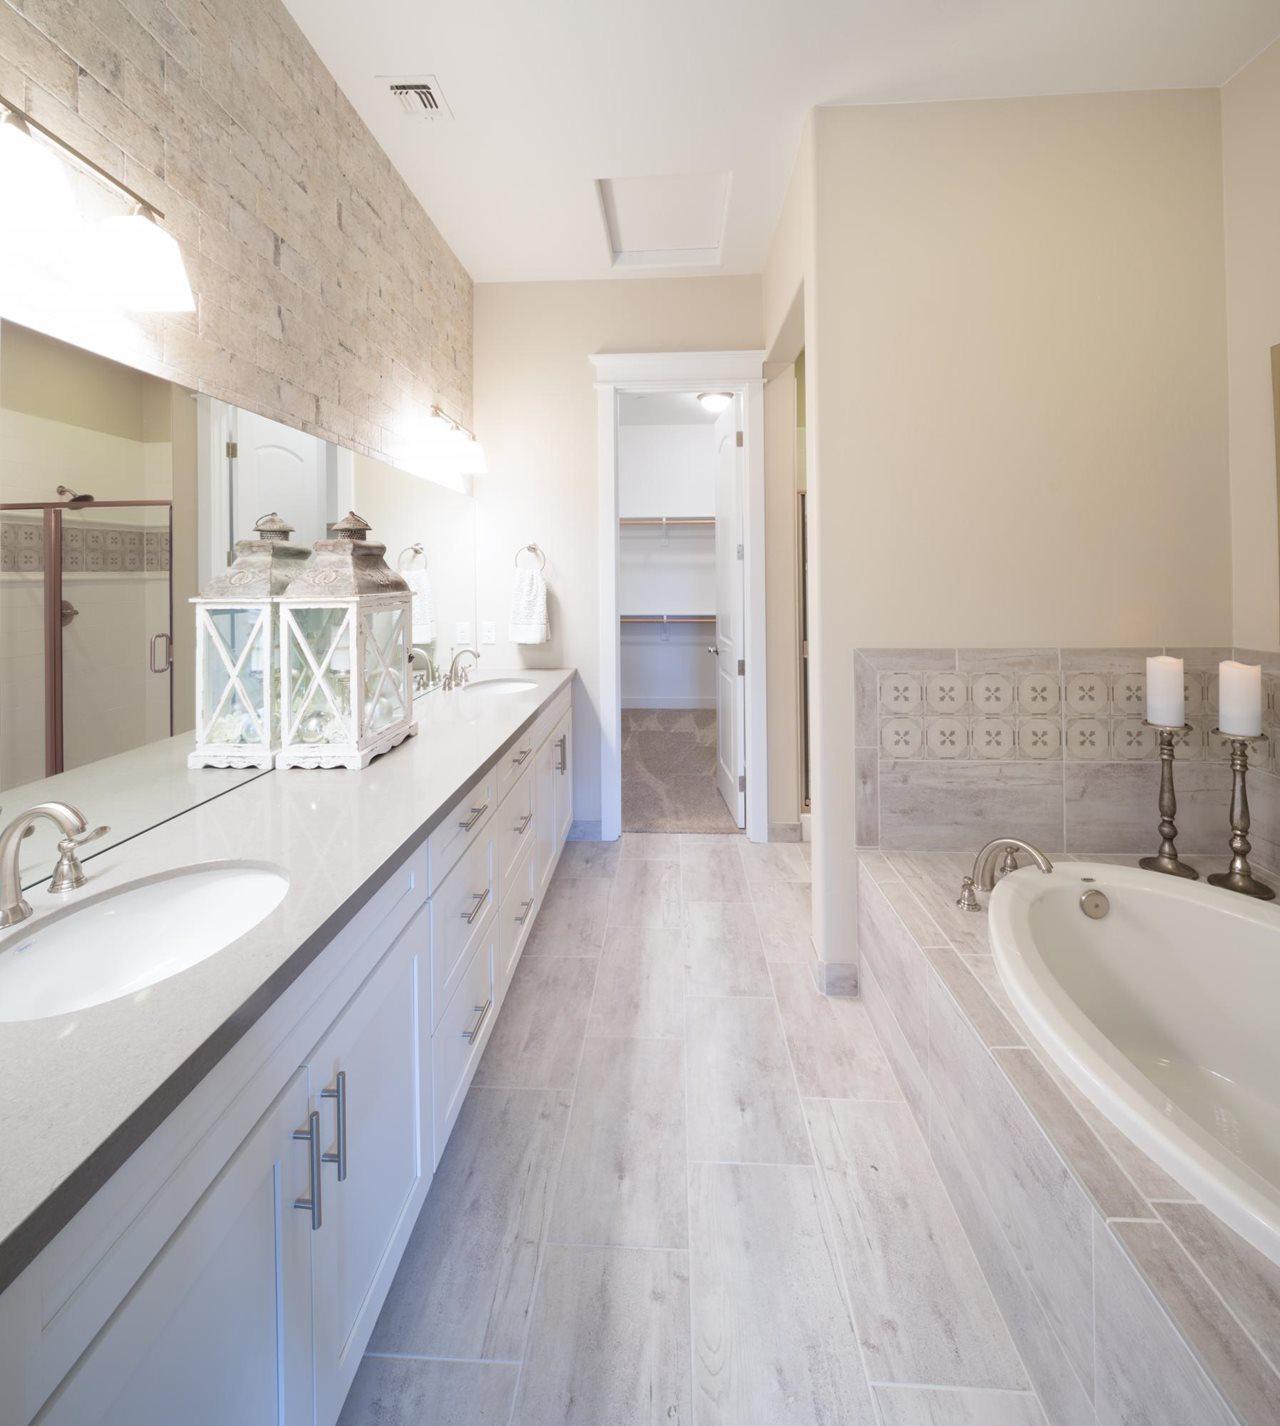 Bathroom featured in the Aspen Ridge Plan 3 By Capstone Homes in Flagstaff, AZ